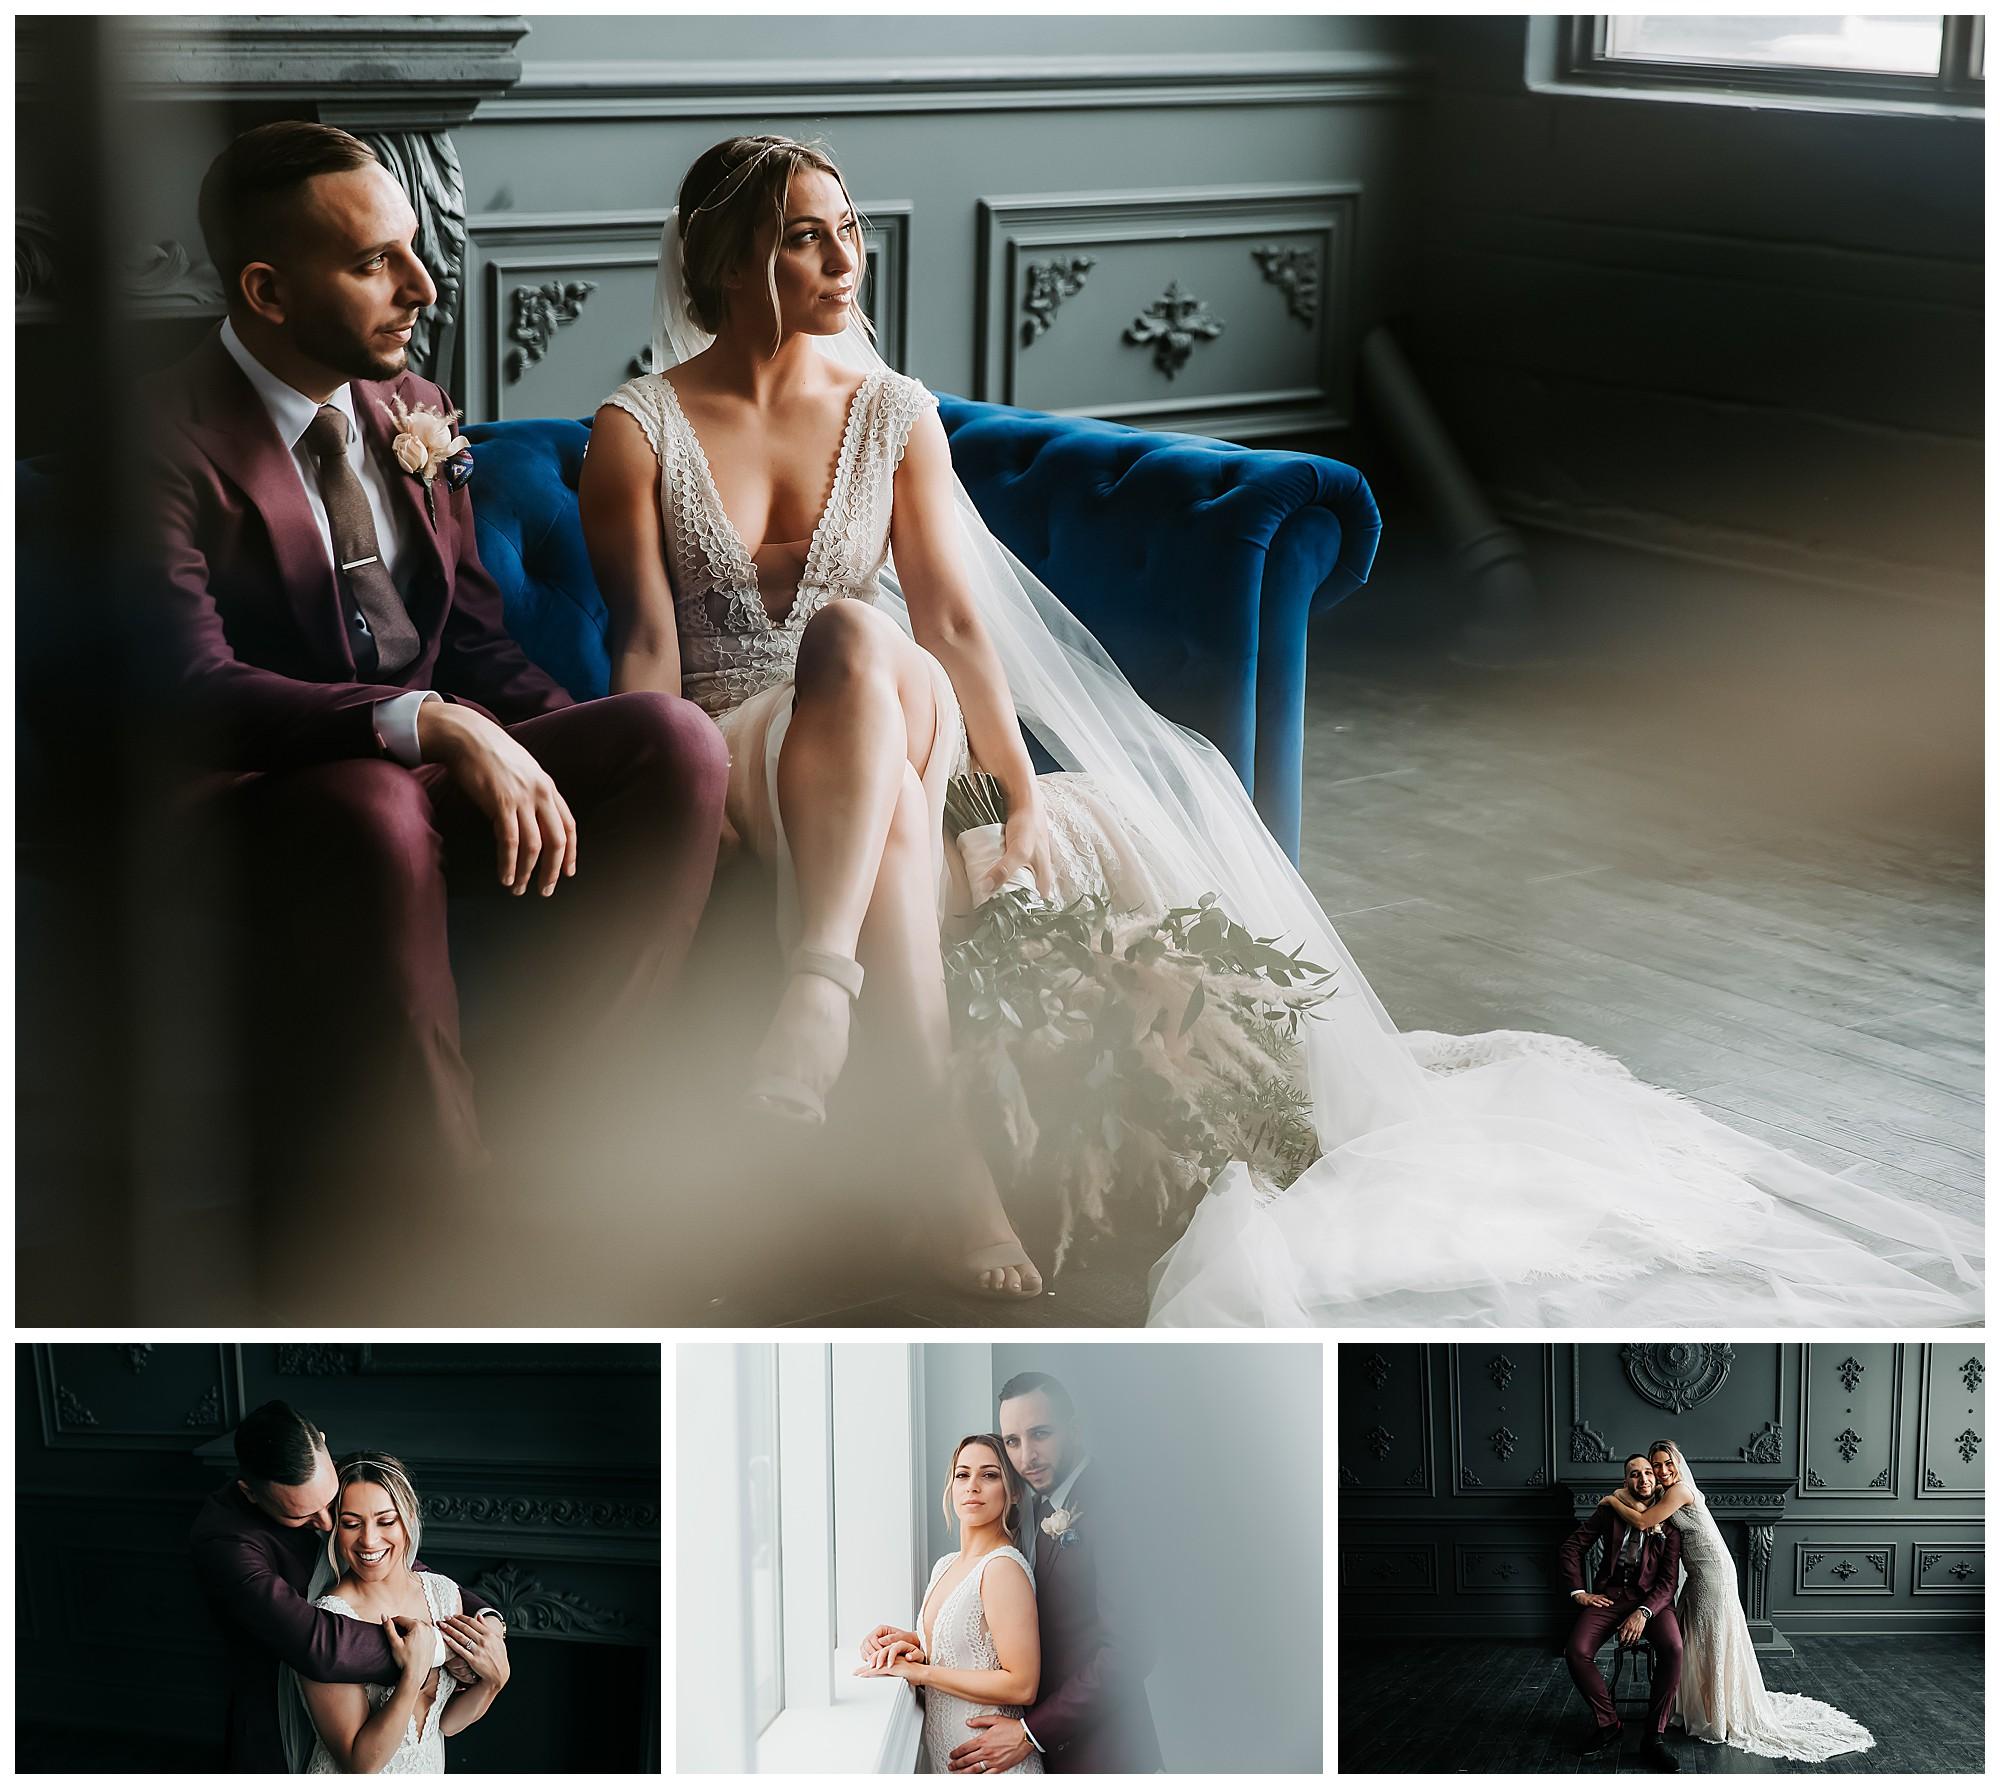 Joanna-Christos-Grand-Luxe-Wedding-Photos-Mint-Room-Toronto-VanDaele-Russell_0091.jpg